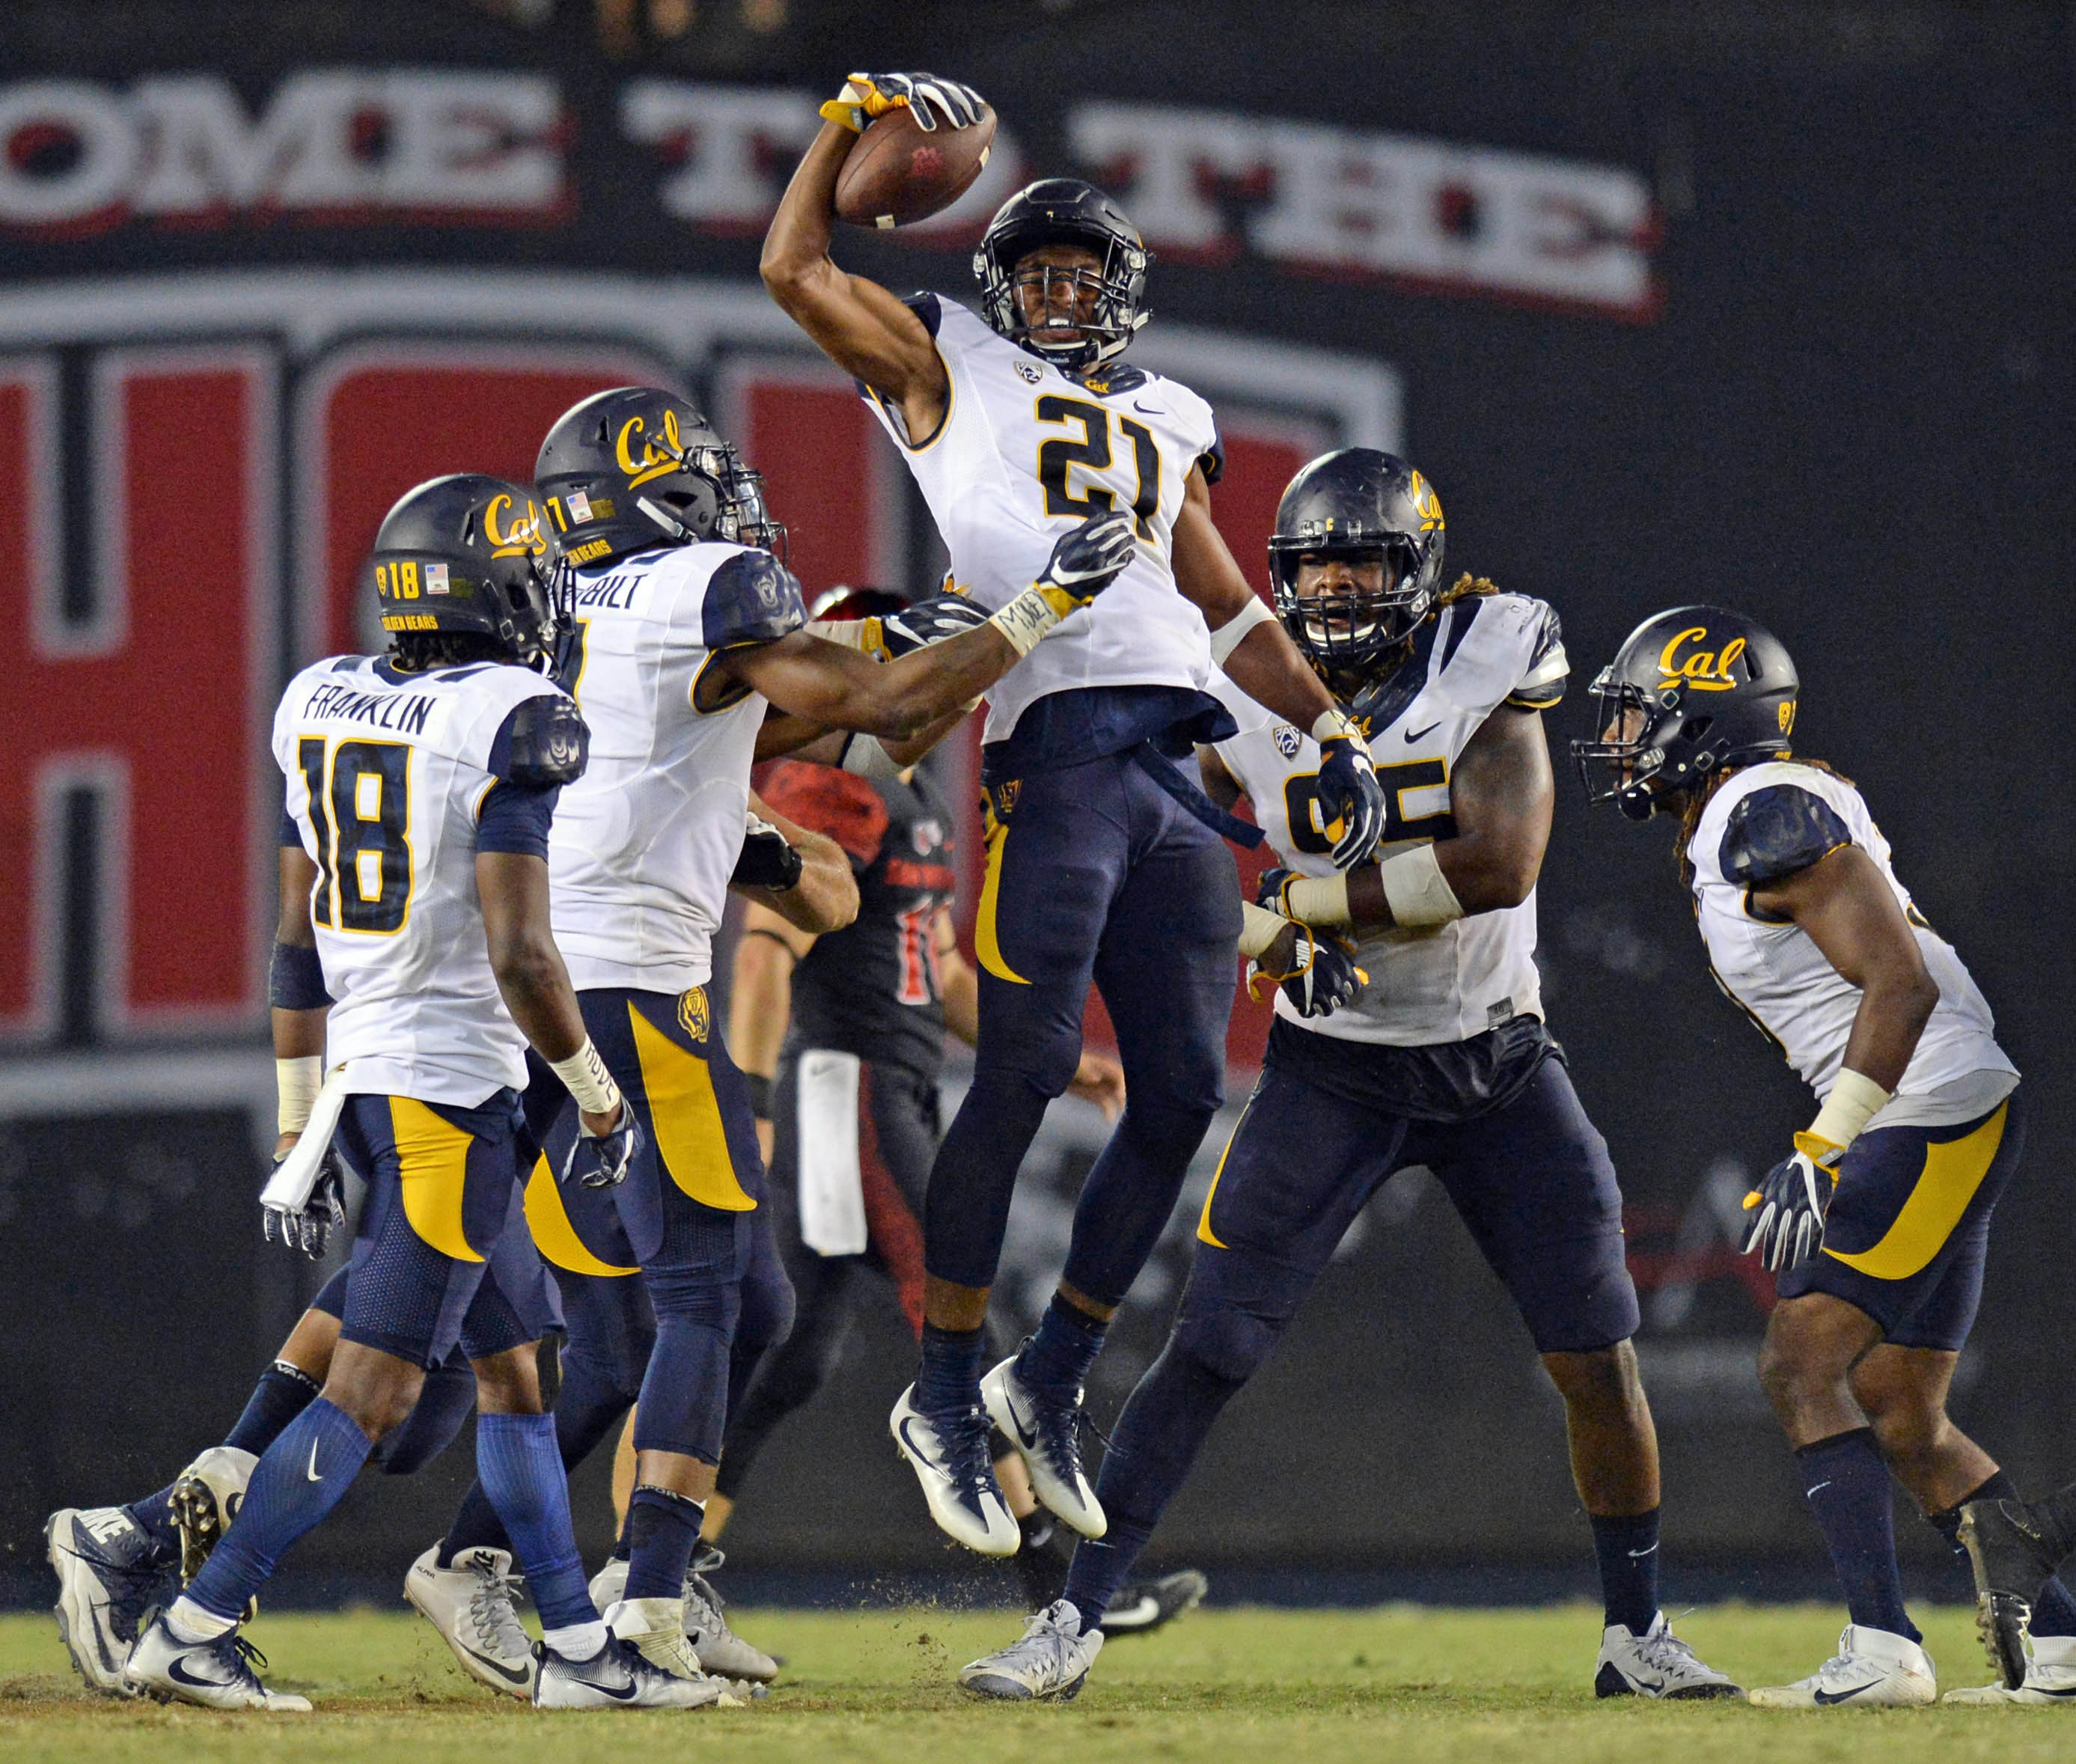 NCAA Football: California at San Diego State